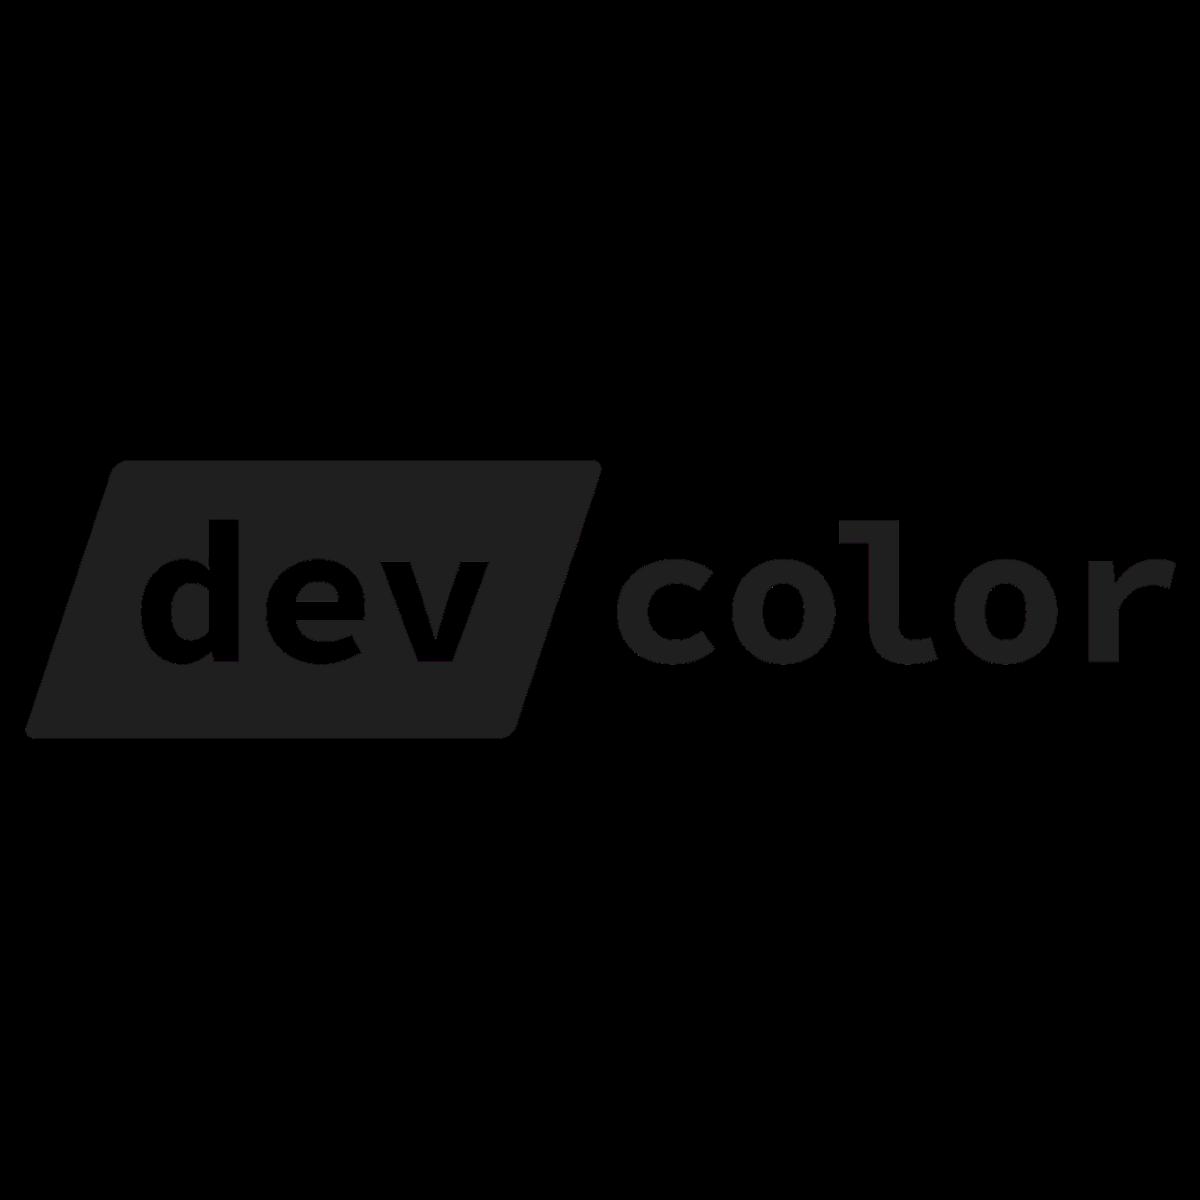 /dev/color logo